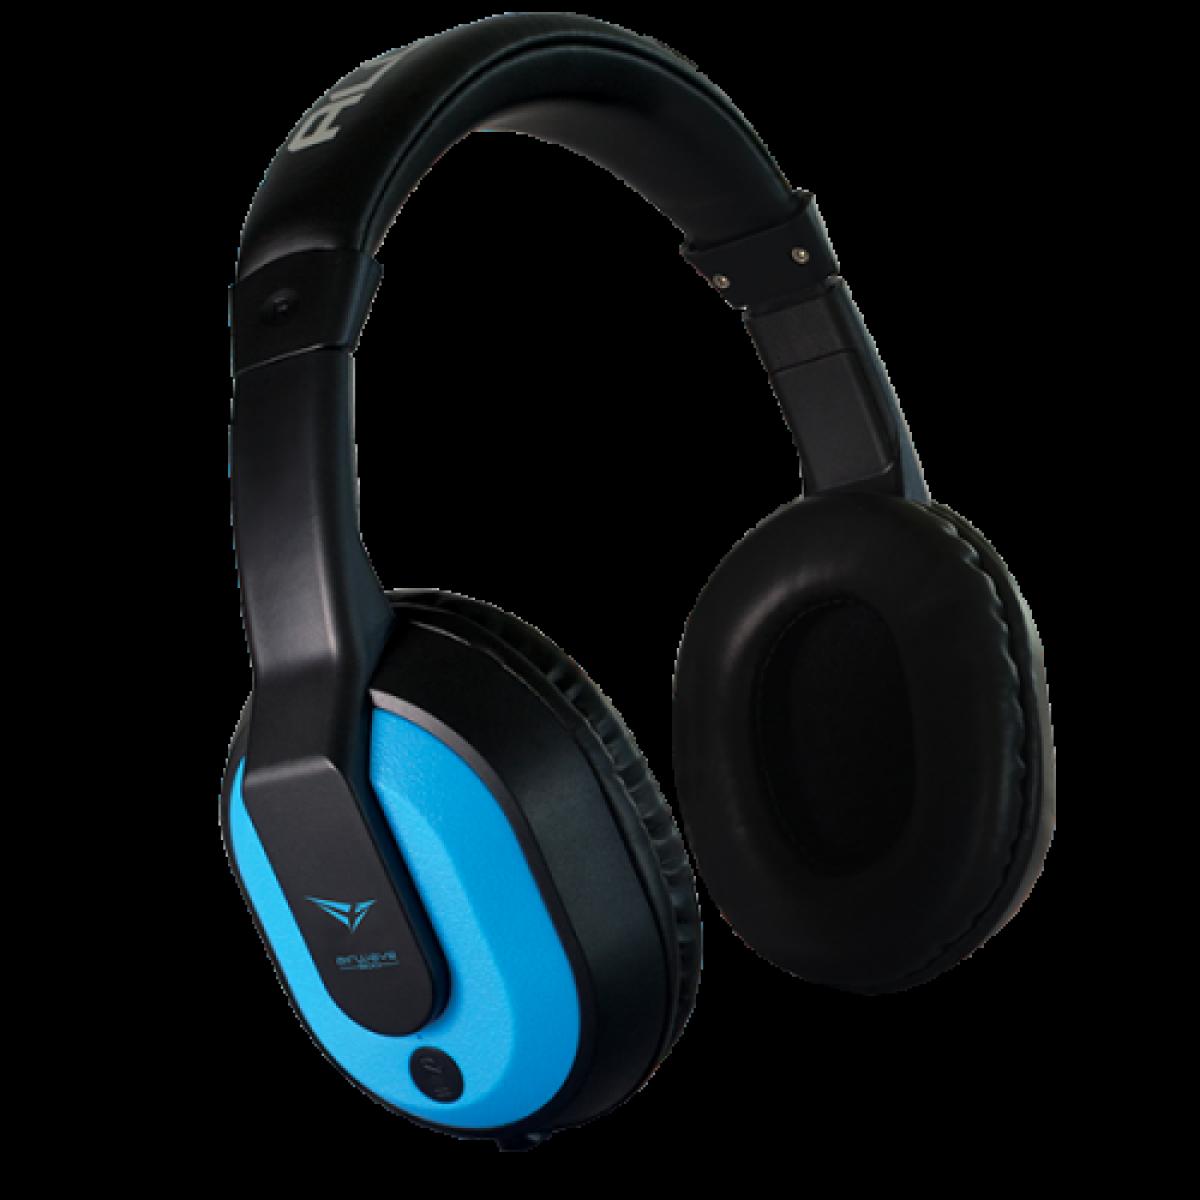 Alcatroz Airwave 300 Wireless Bluetooth Over-Ear Headphone Turquoise